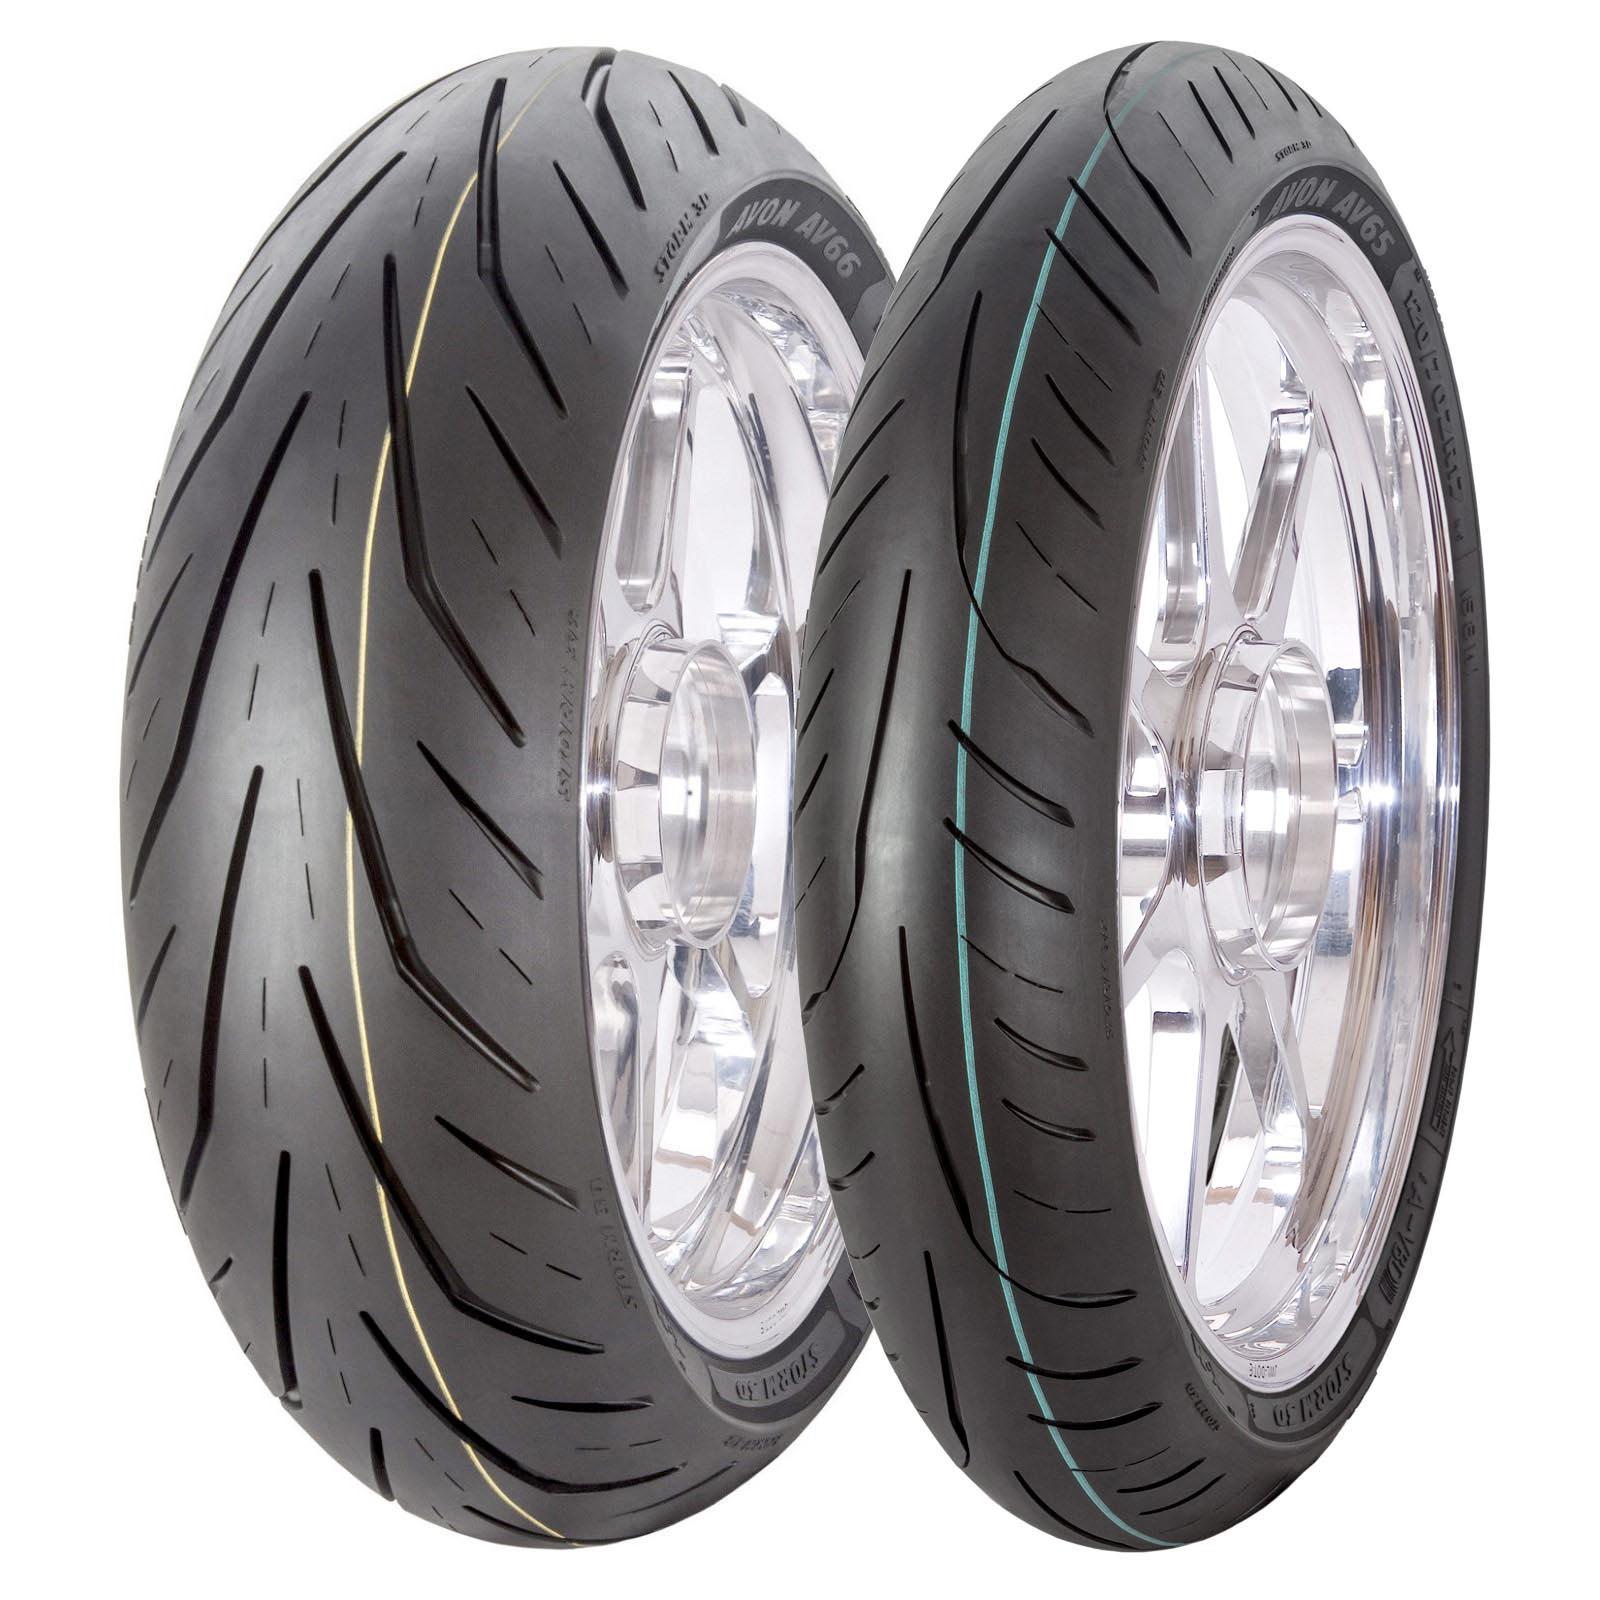 Amazon.com: Avon AV66 Storm 3D XM 180/55ZR17 Rear Tire